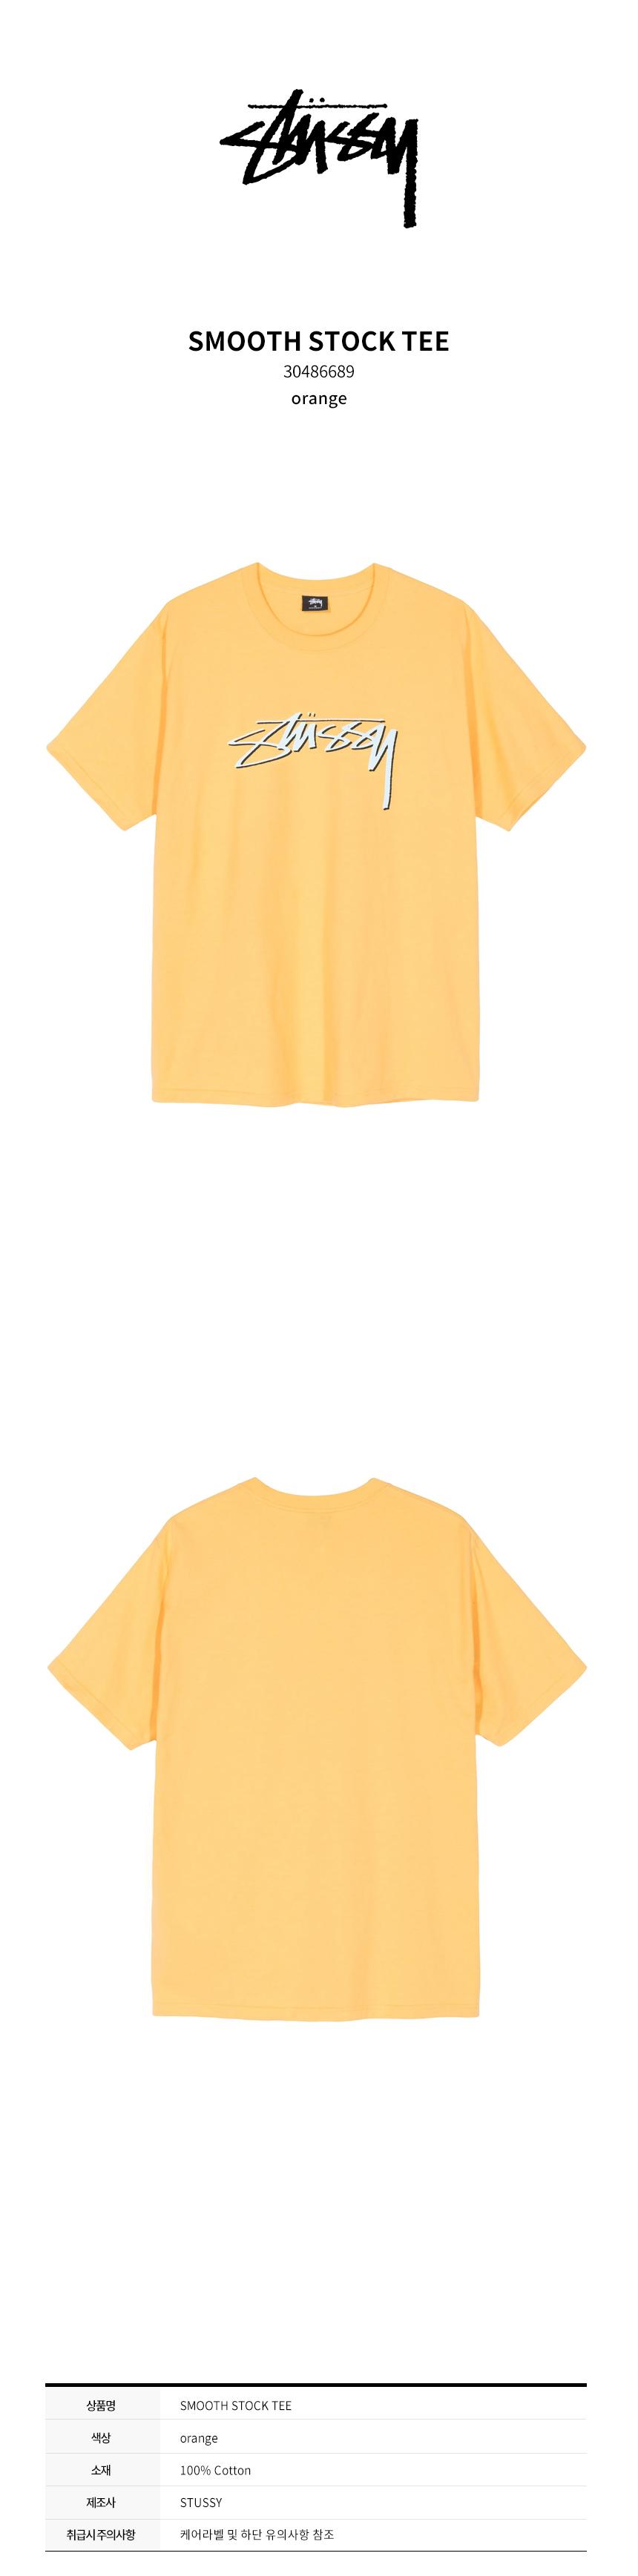 30486689_orange.jpg